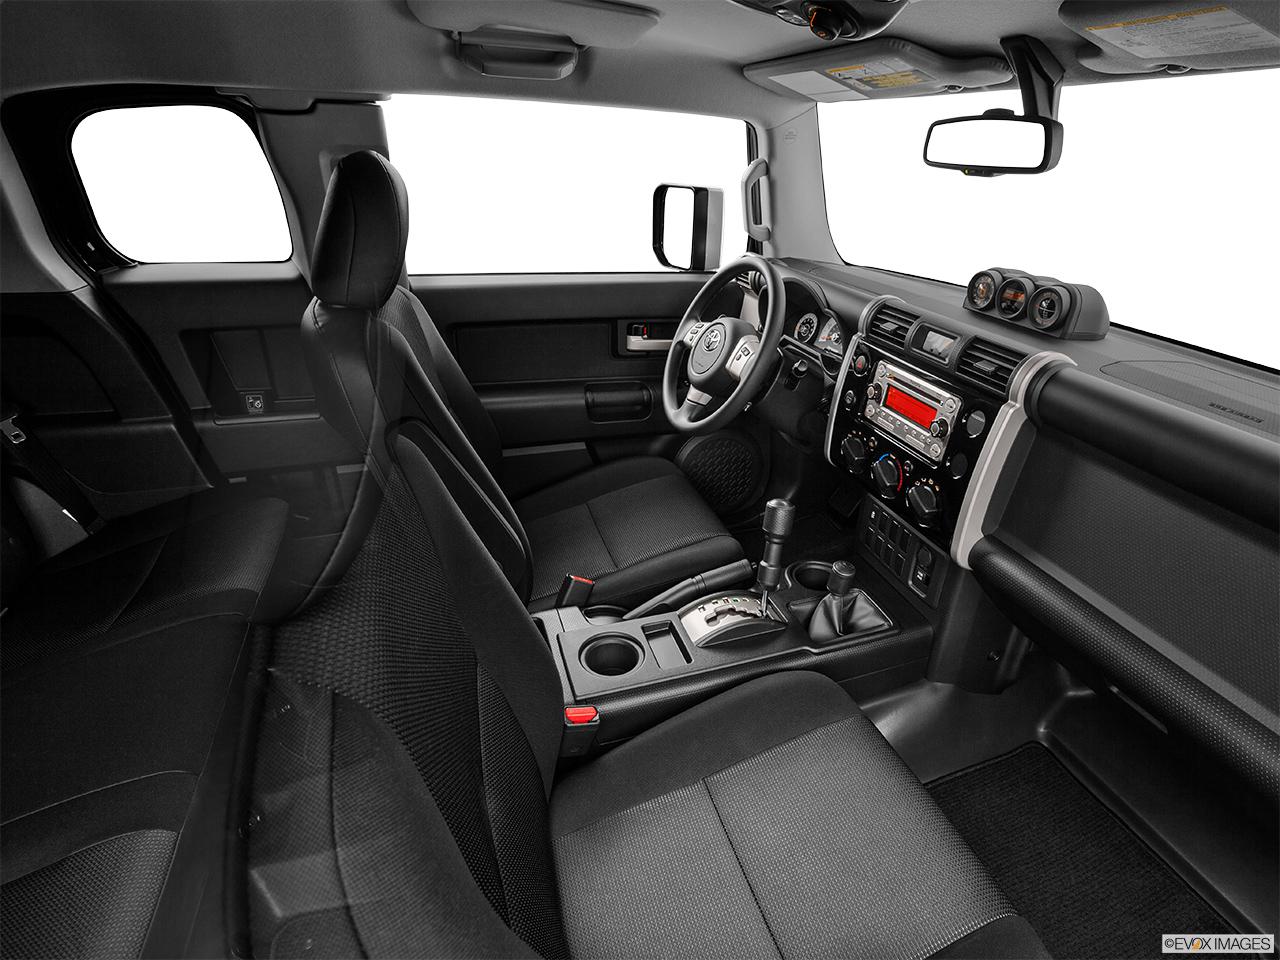 2014 toyota fj cruiser interior. 2014 toyota fj cruiser 4wd manual fake buck shot interior from passenger b pillar fj